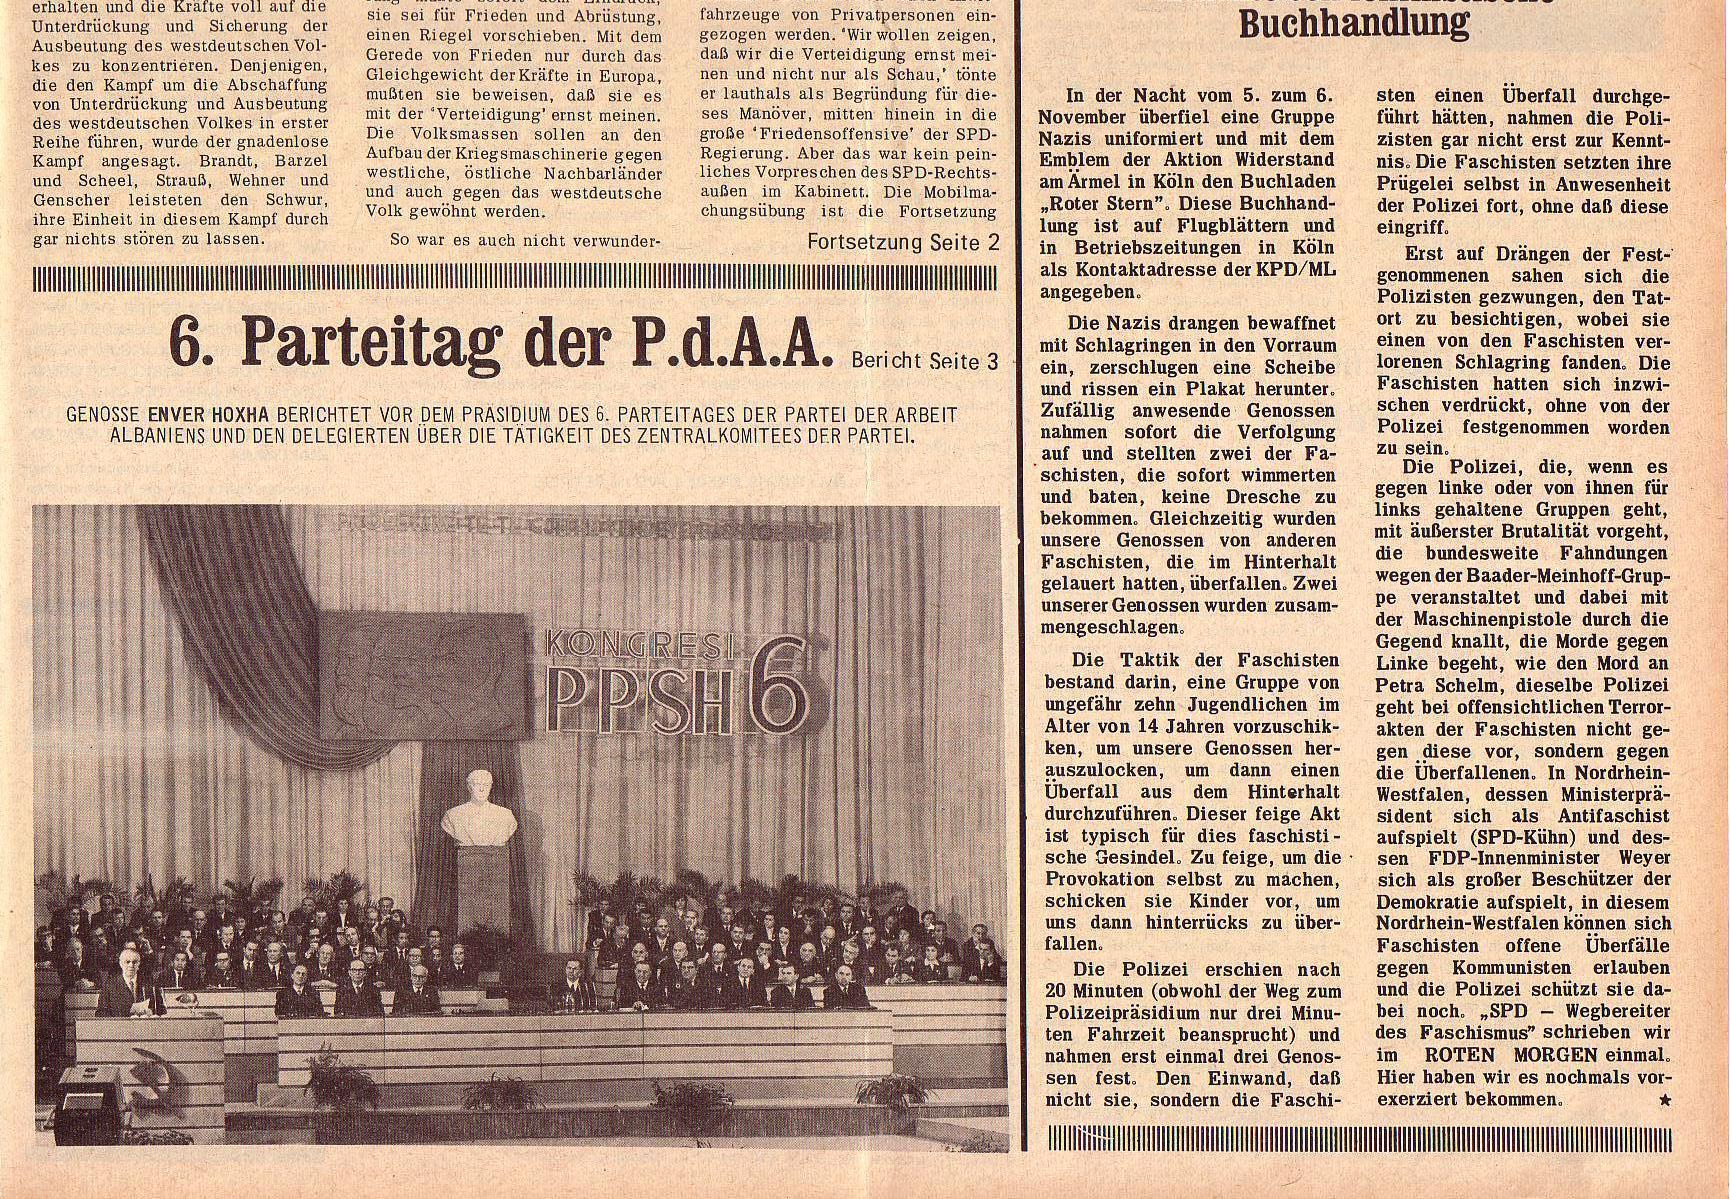 Roter Morgen, 5. Jg., 22. November 1971, Nr. 14, Seite 1b